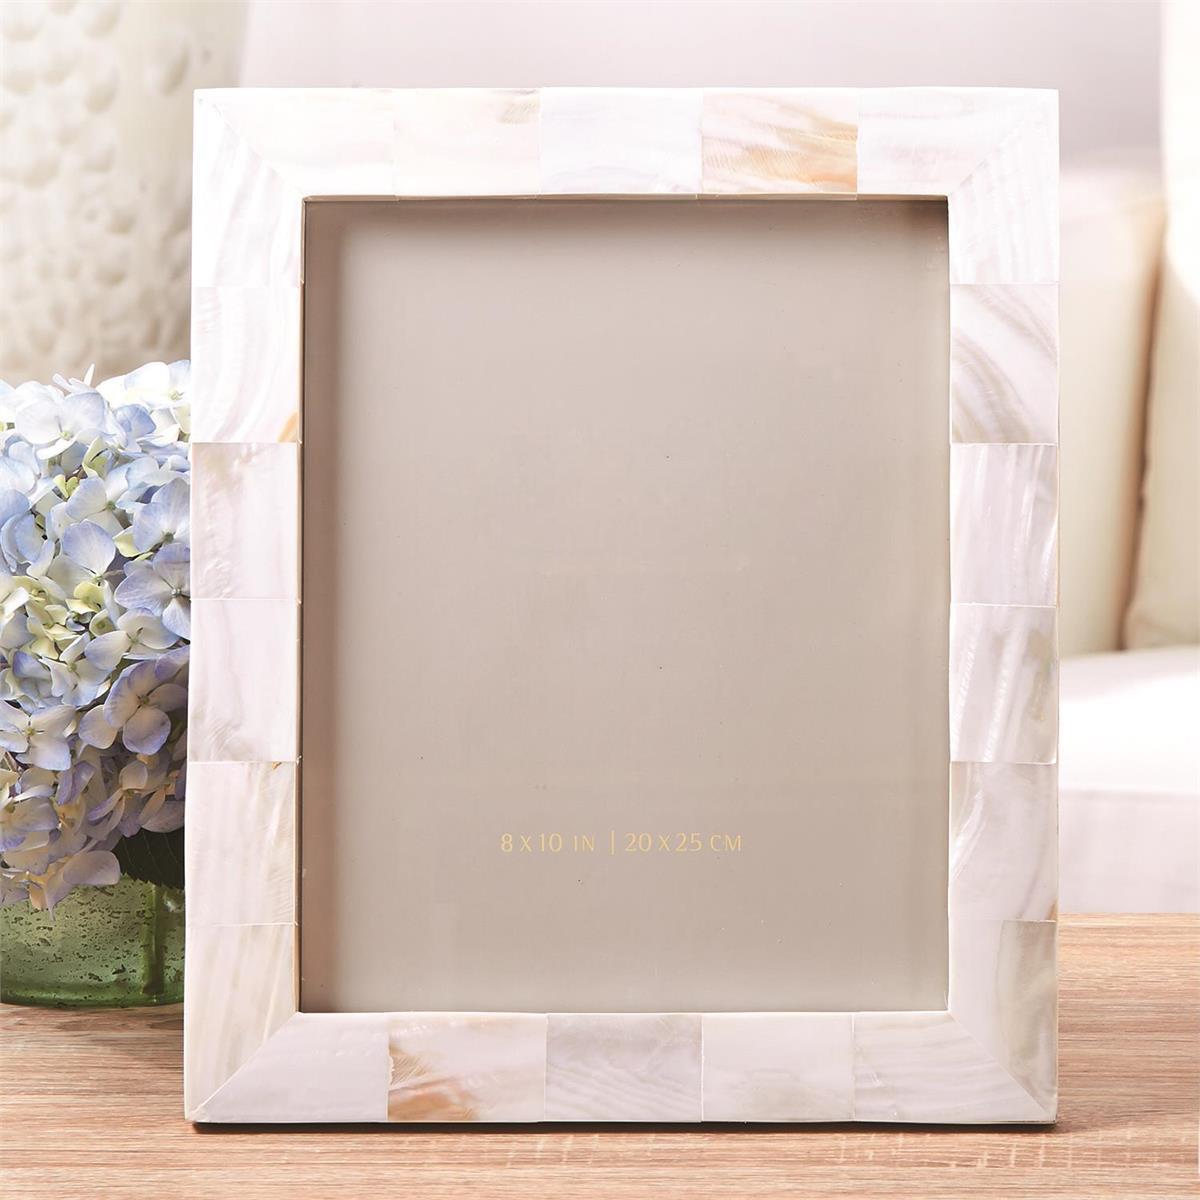 Vanilla MOP Frame   8 x 10